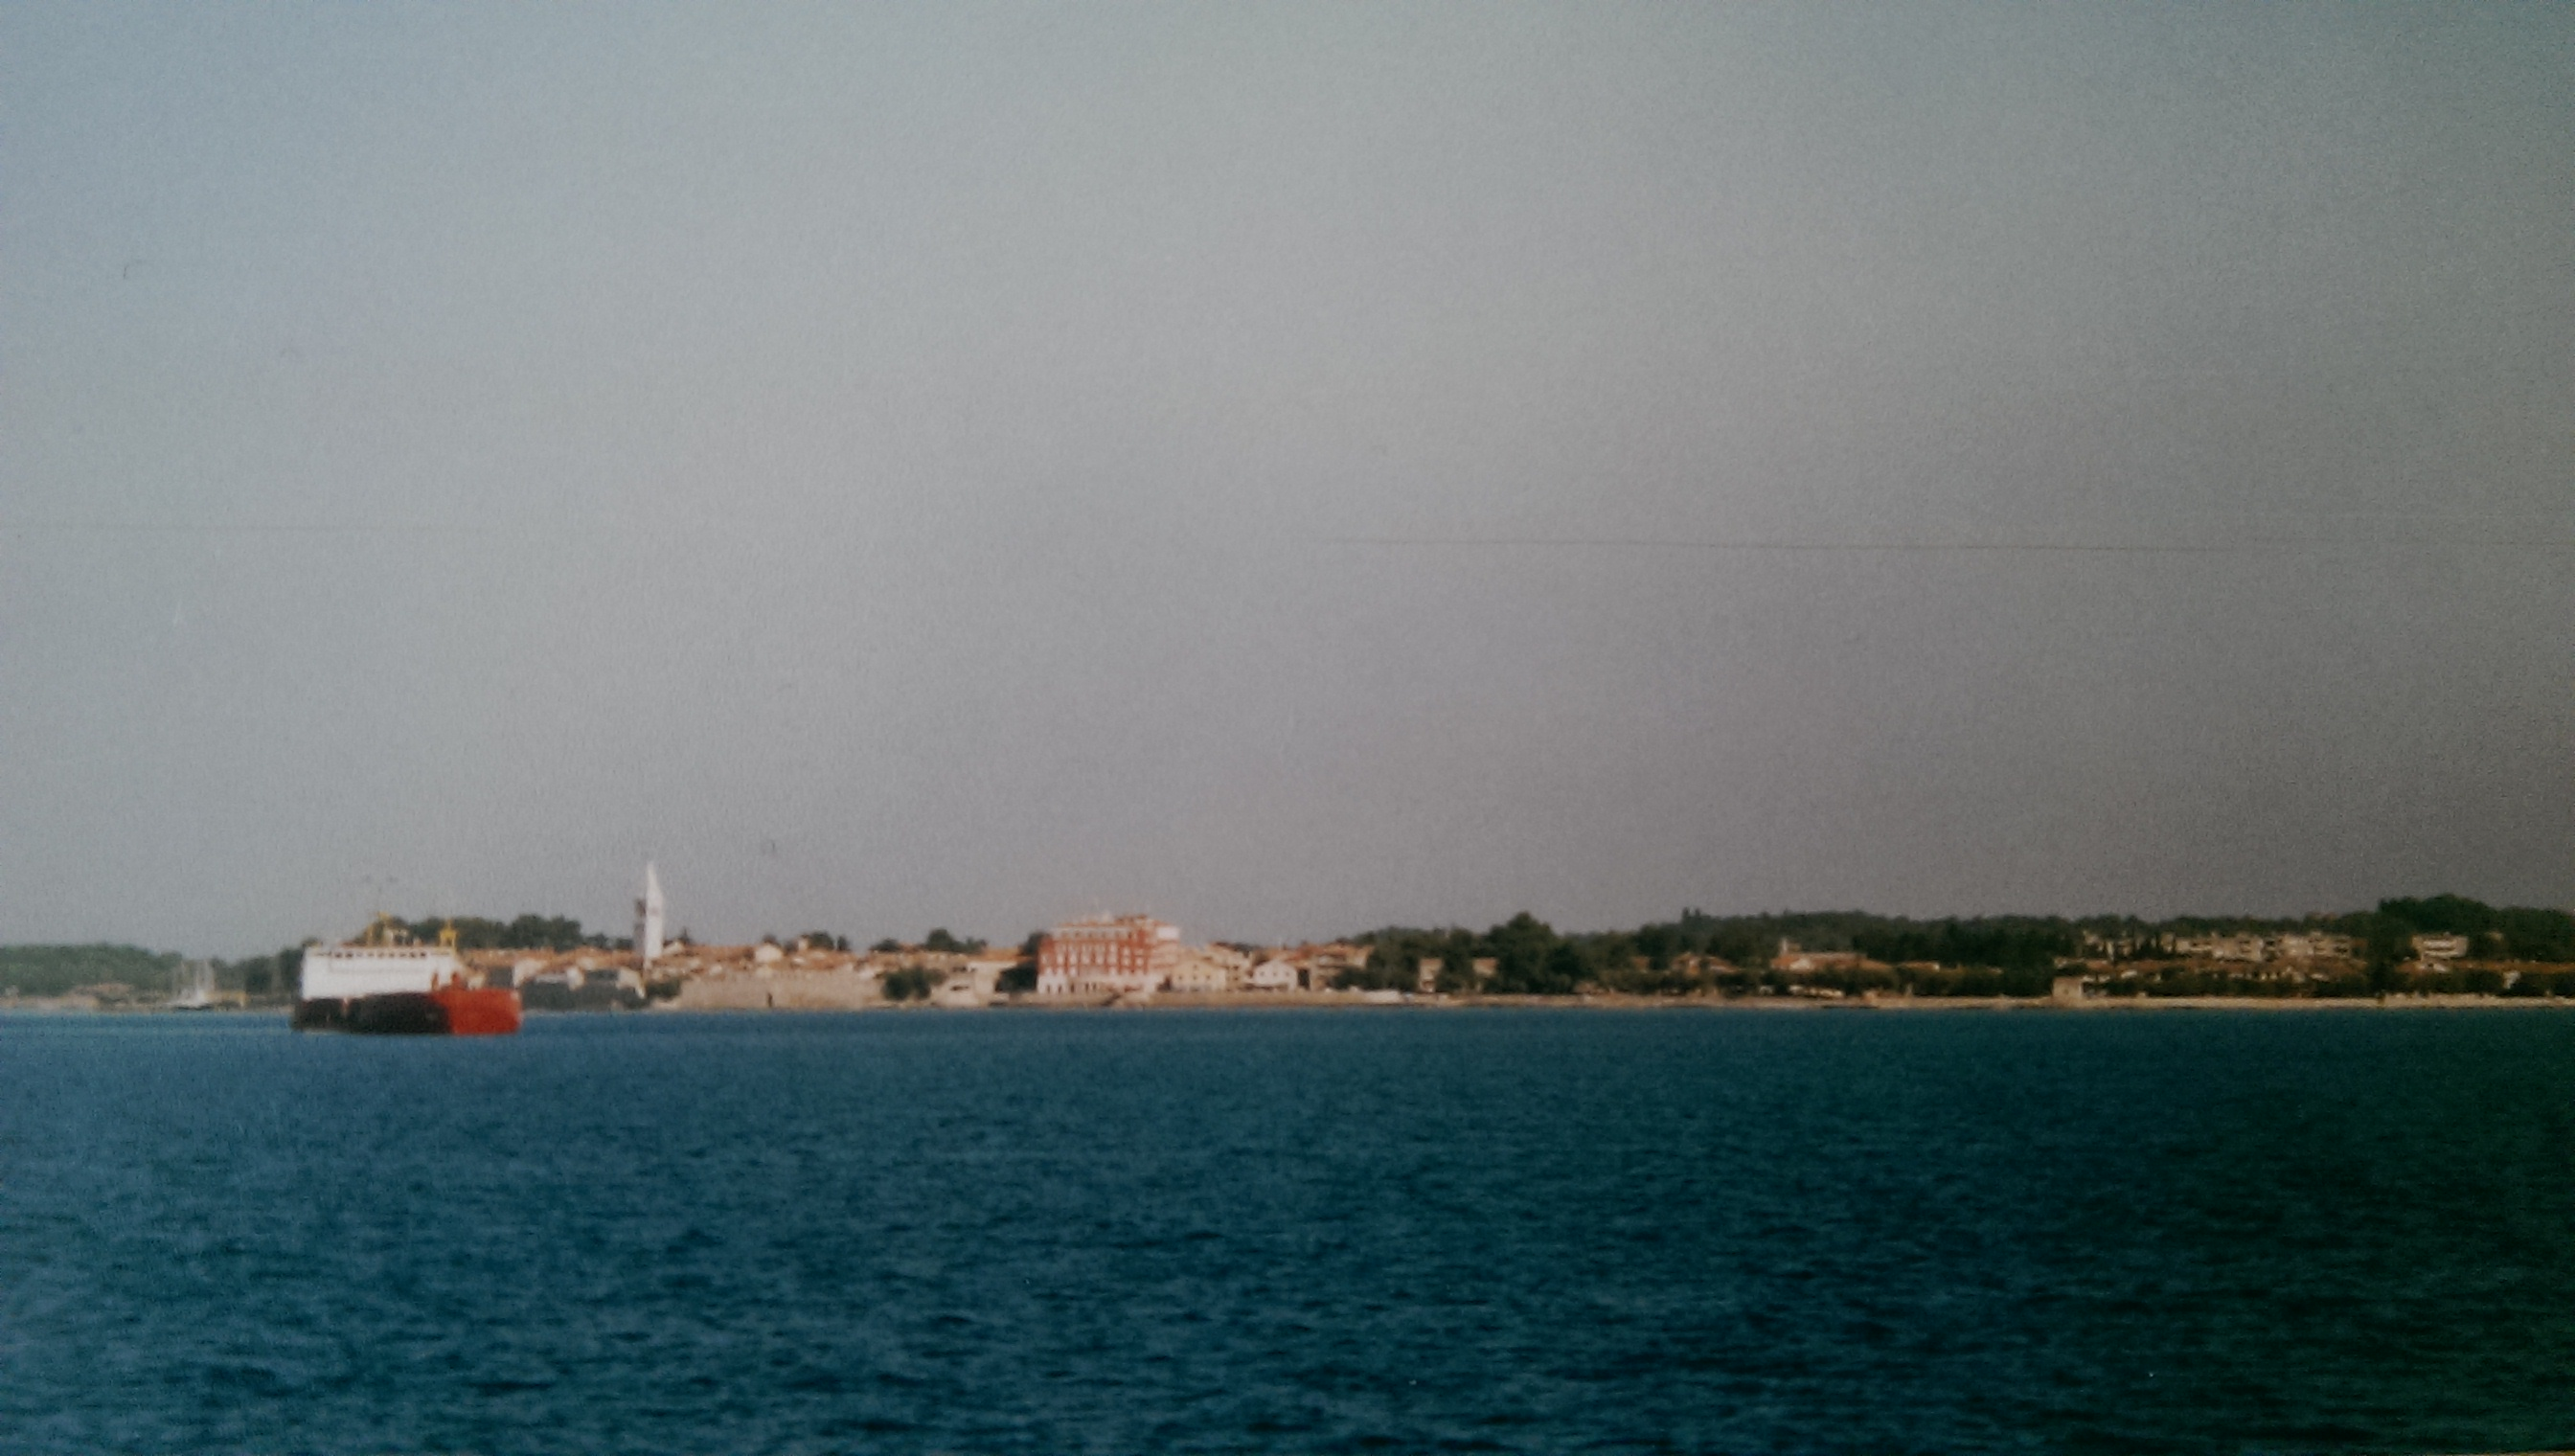 IMAG1467